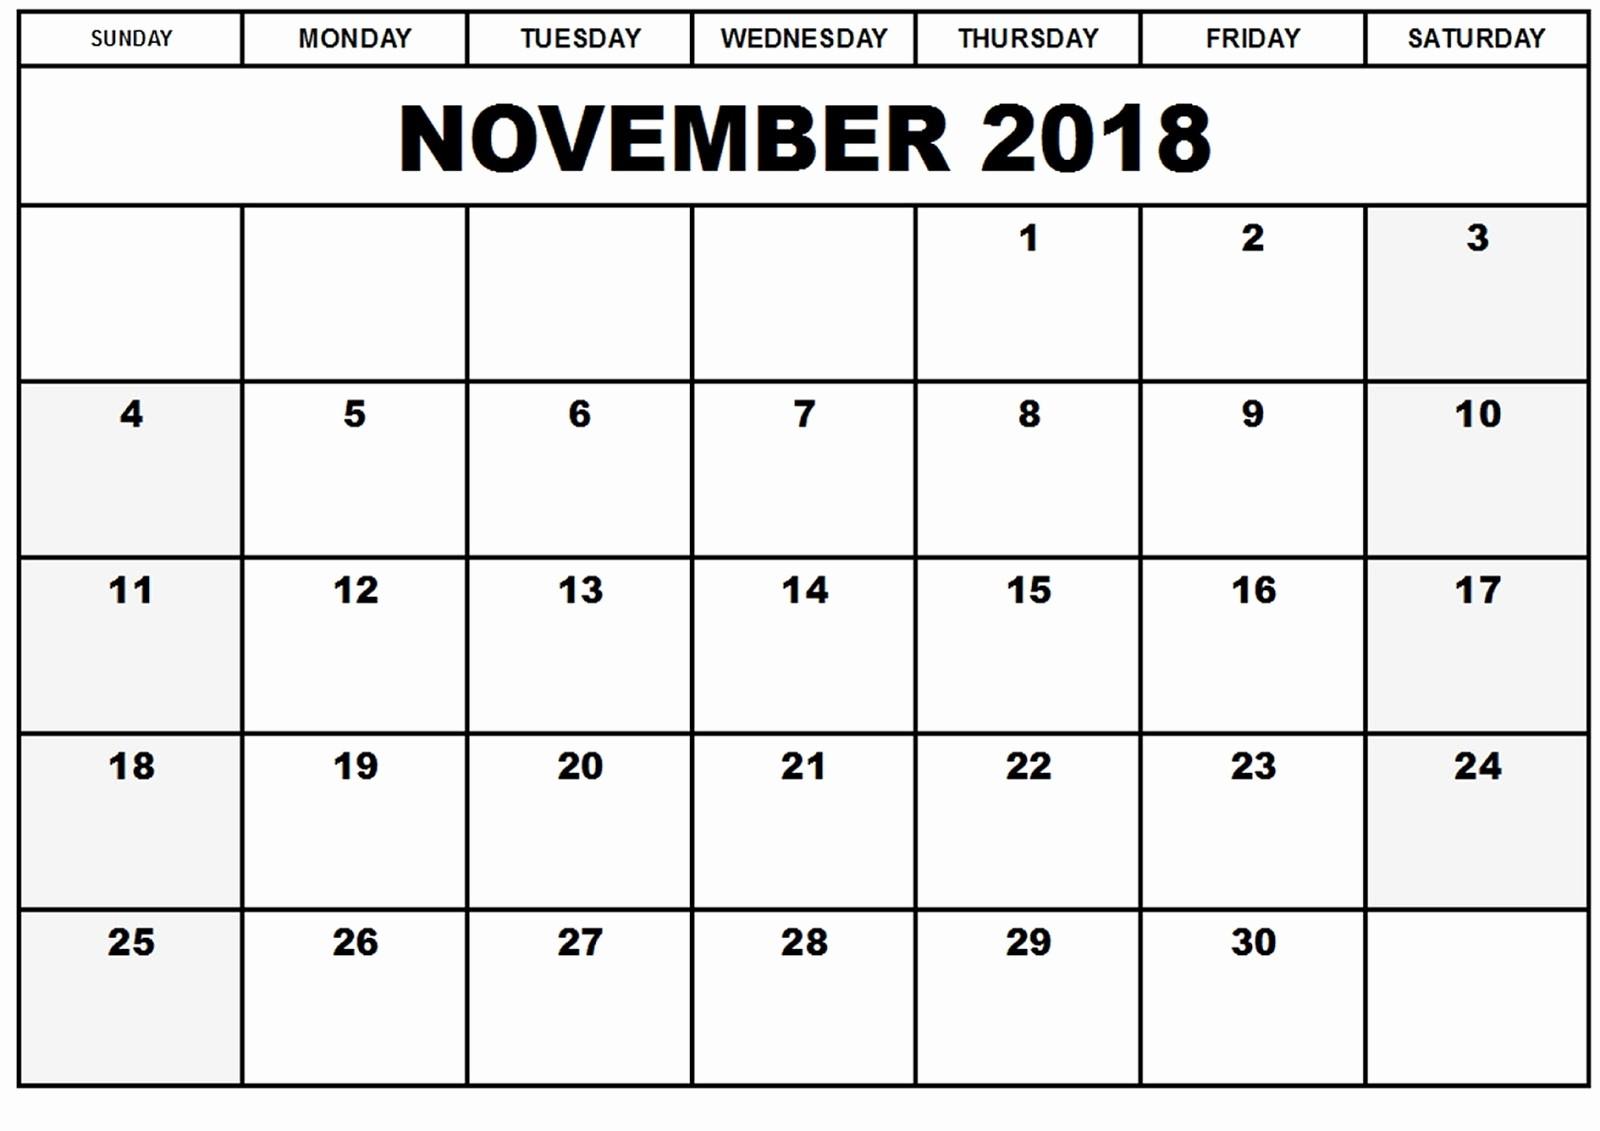 2018 Month by Month Calendar Unique November 2018 Calendar Template